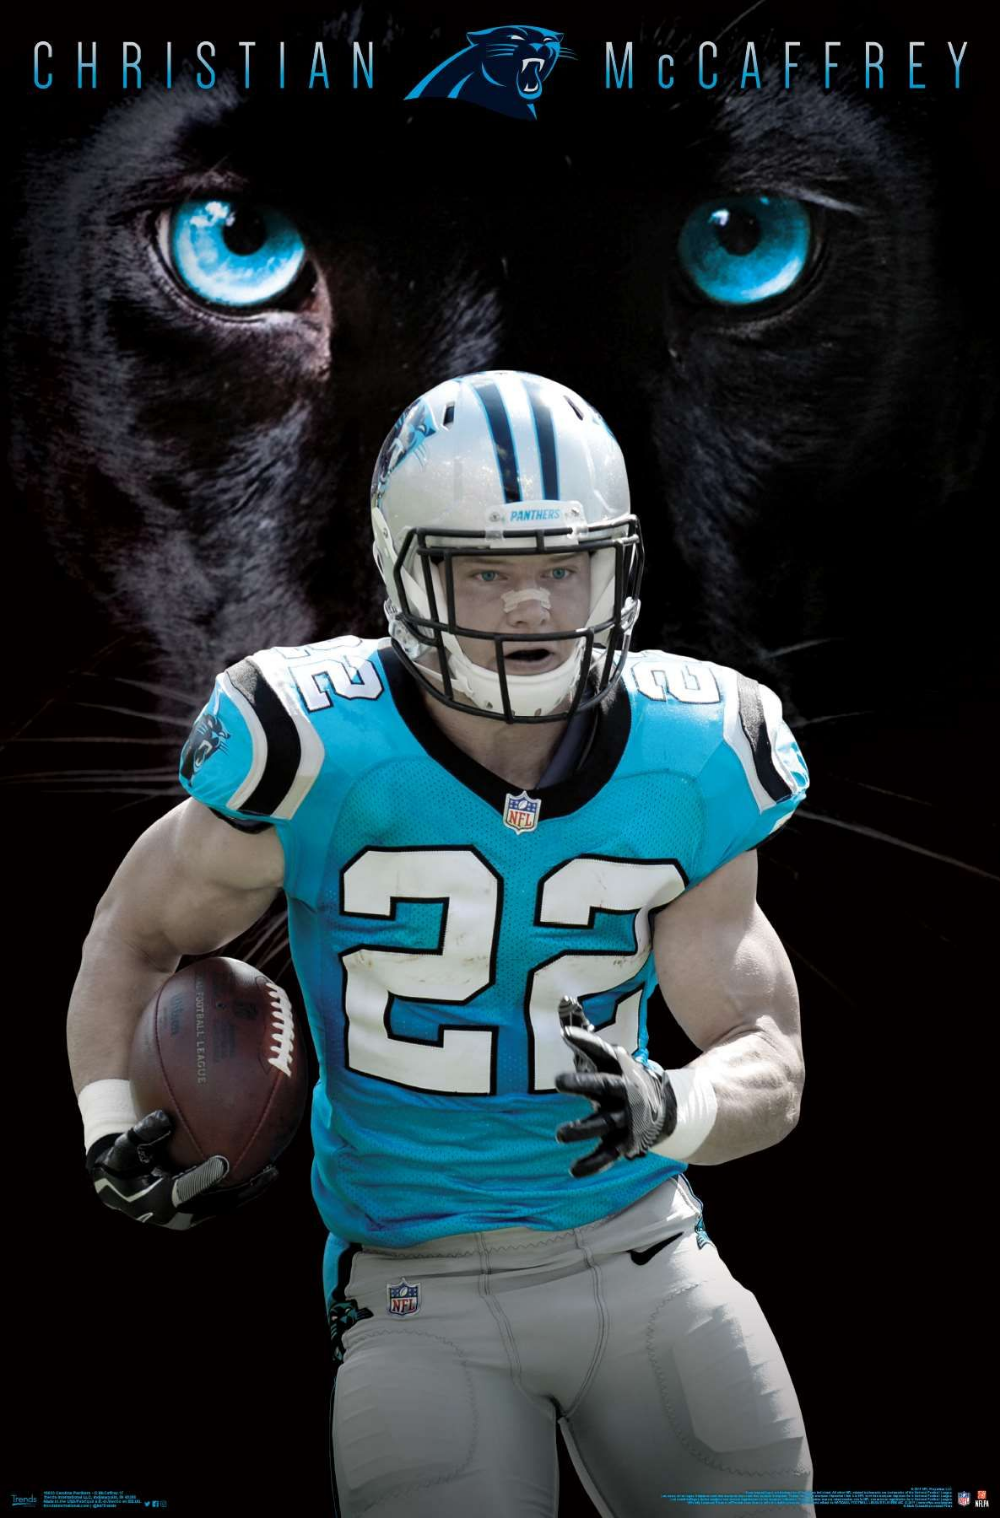 Nfl Carolina Panthers Christian Mccaffrey 17 Christian Mccaffrey Carolina Panthers Logo Nfl Carolina Panthers